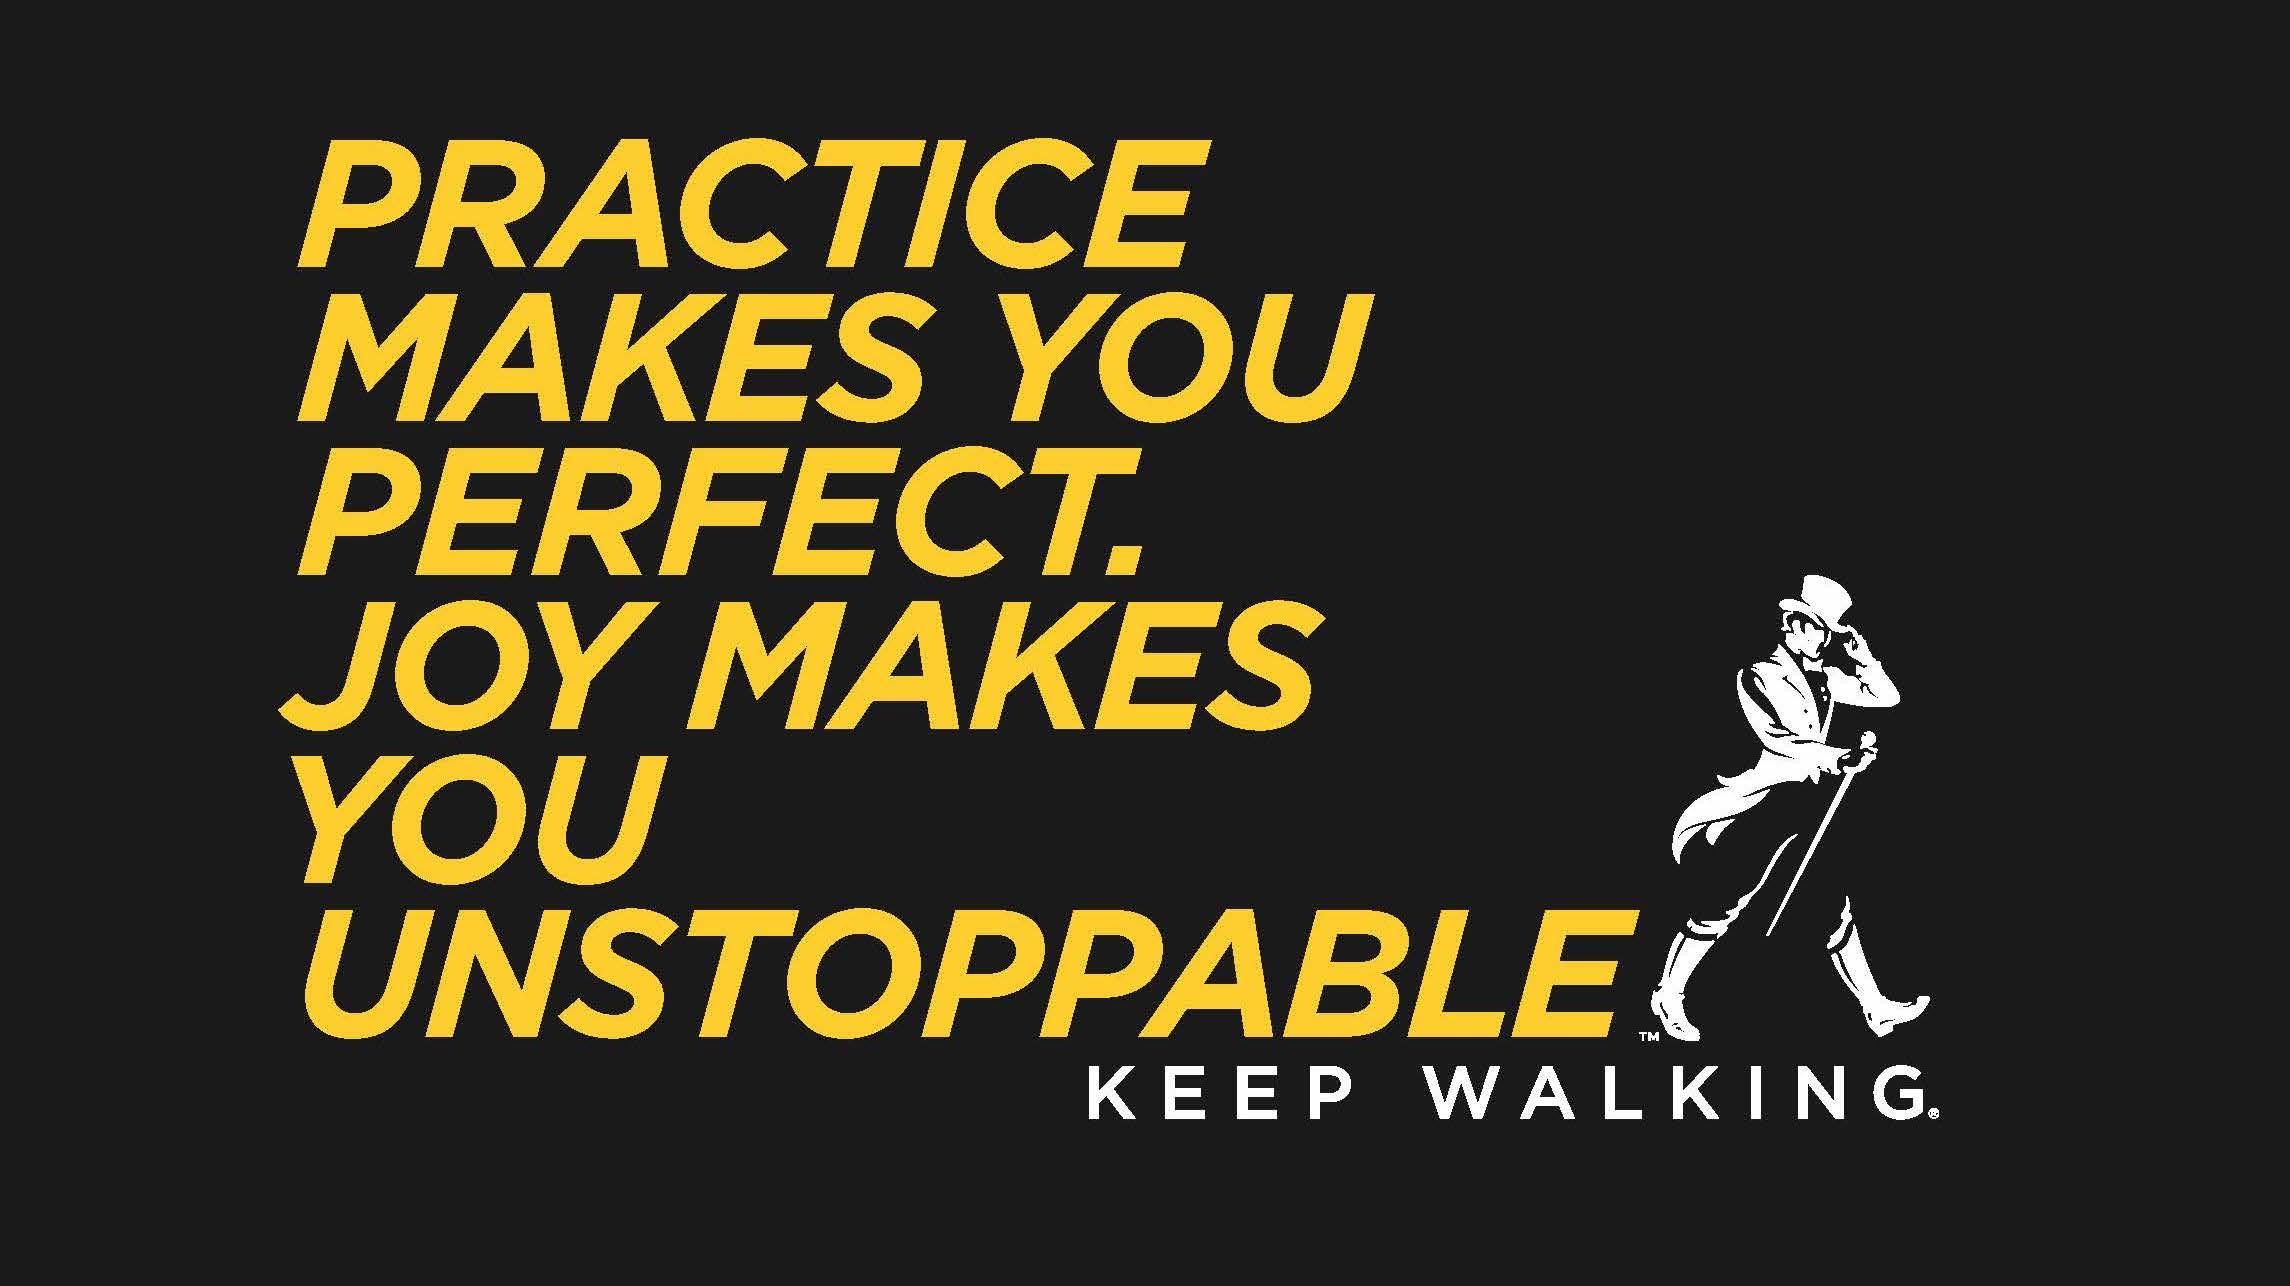 joy_makes_you_unstoppable_mental_agility_gordon_corsetti.jpg